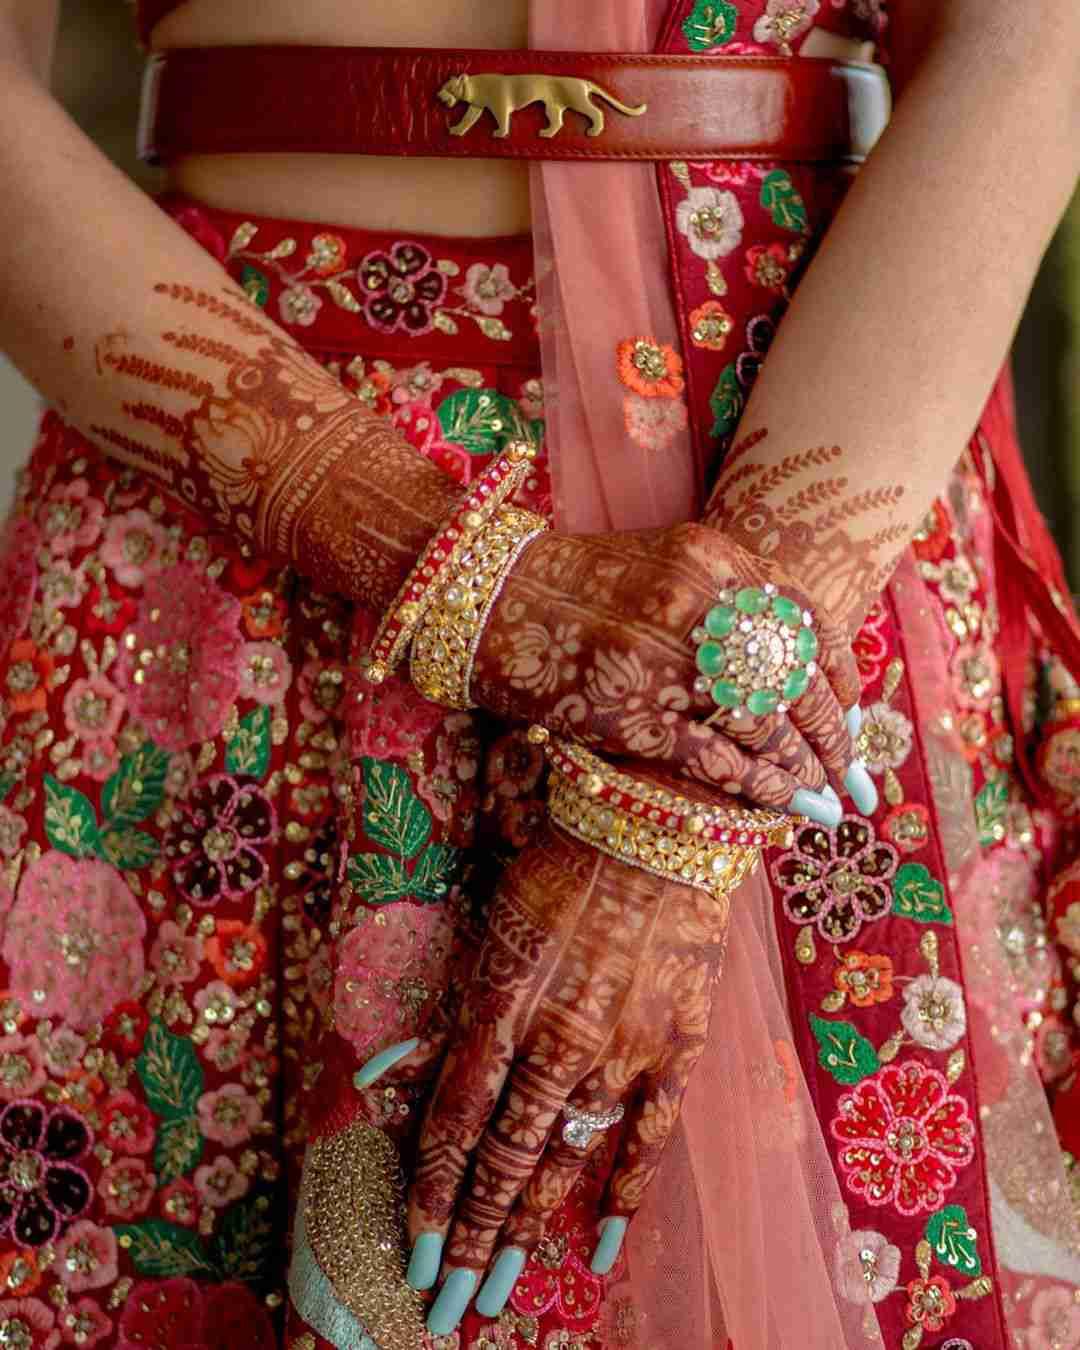 waist belt | bridal belts | customized belts